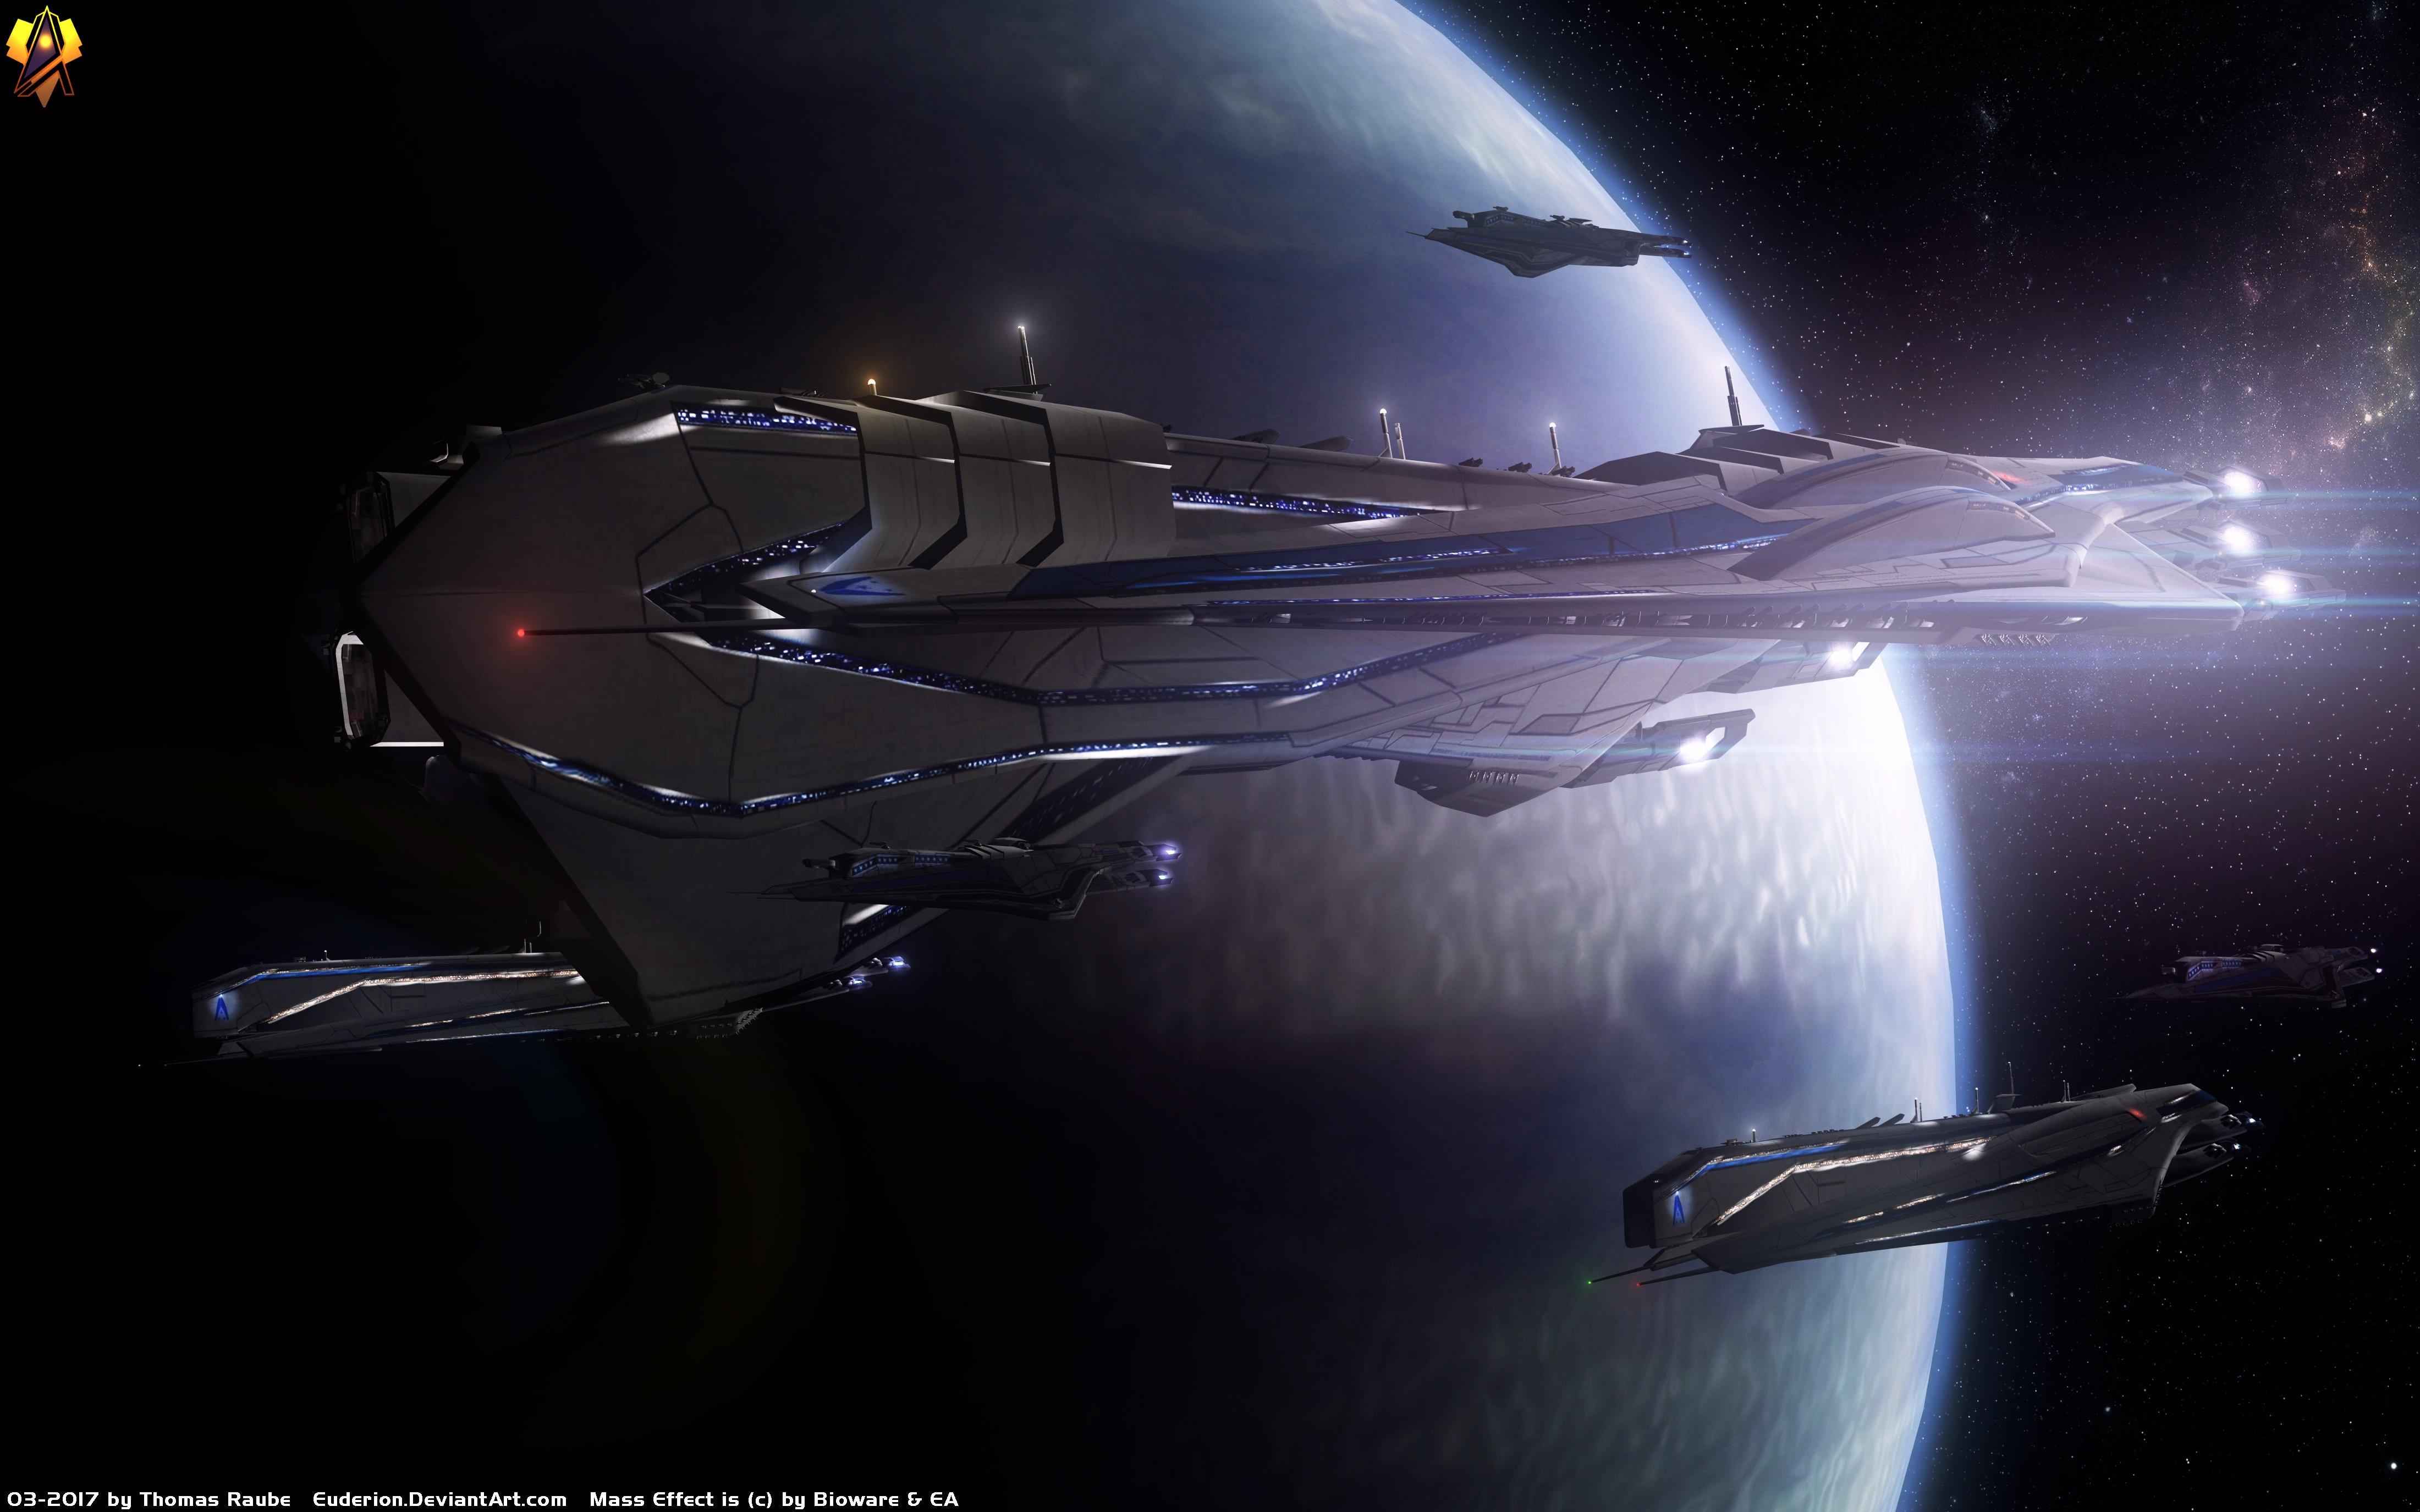 Sagan leaves the Sol System